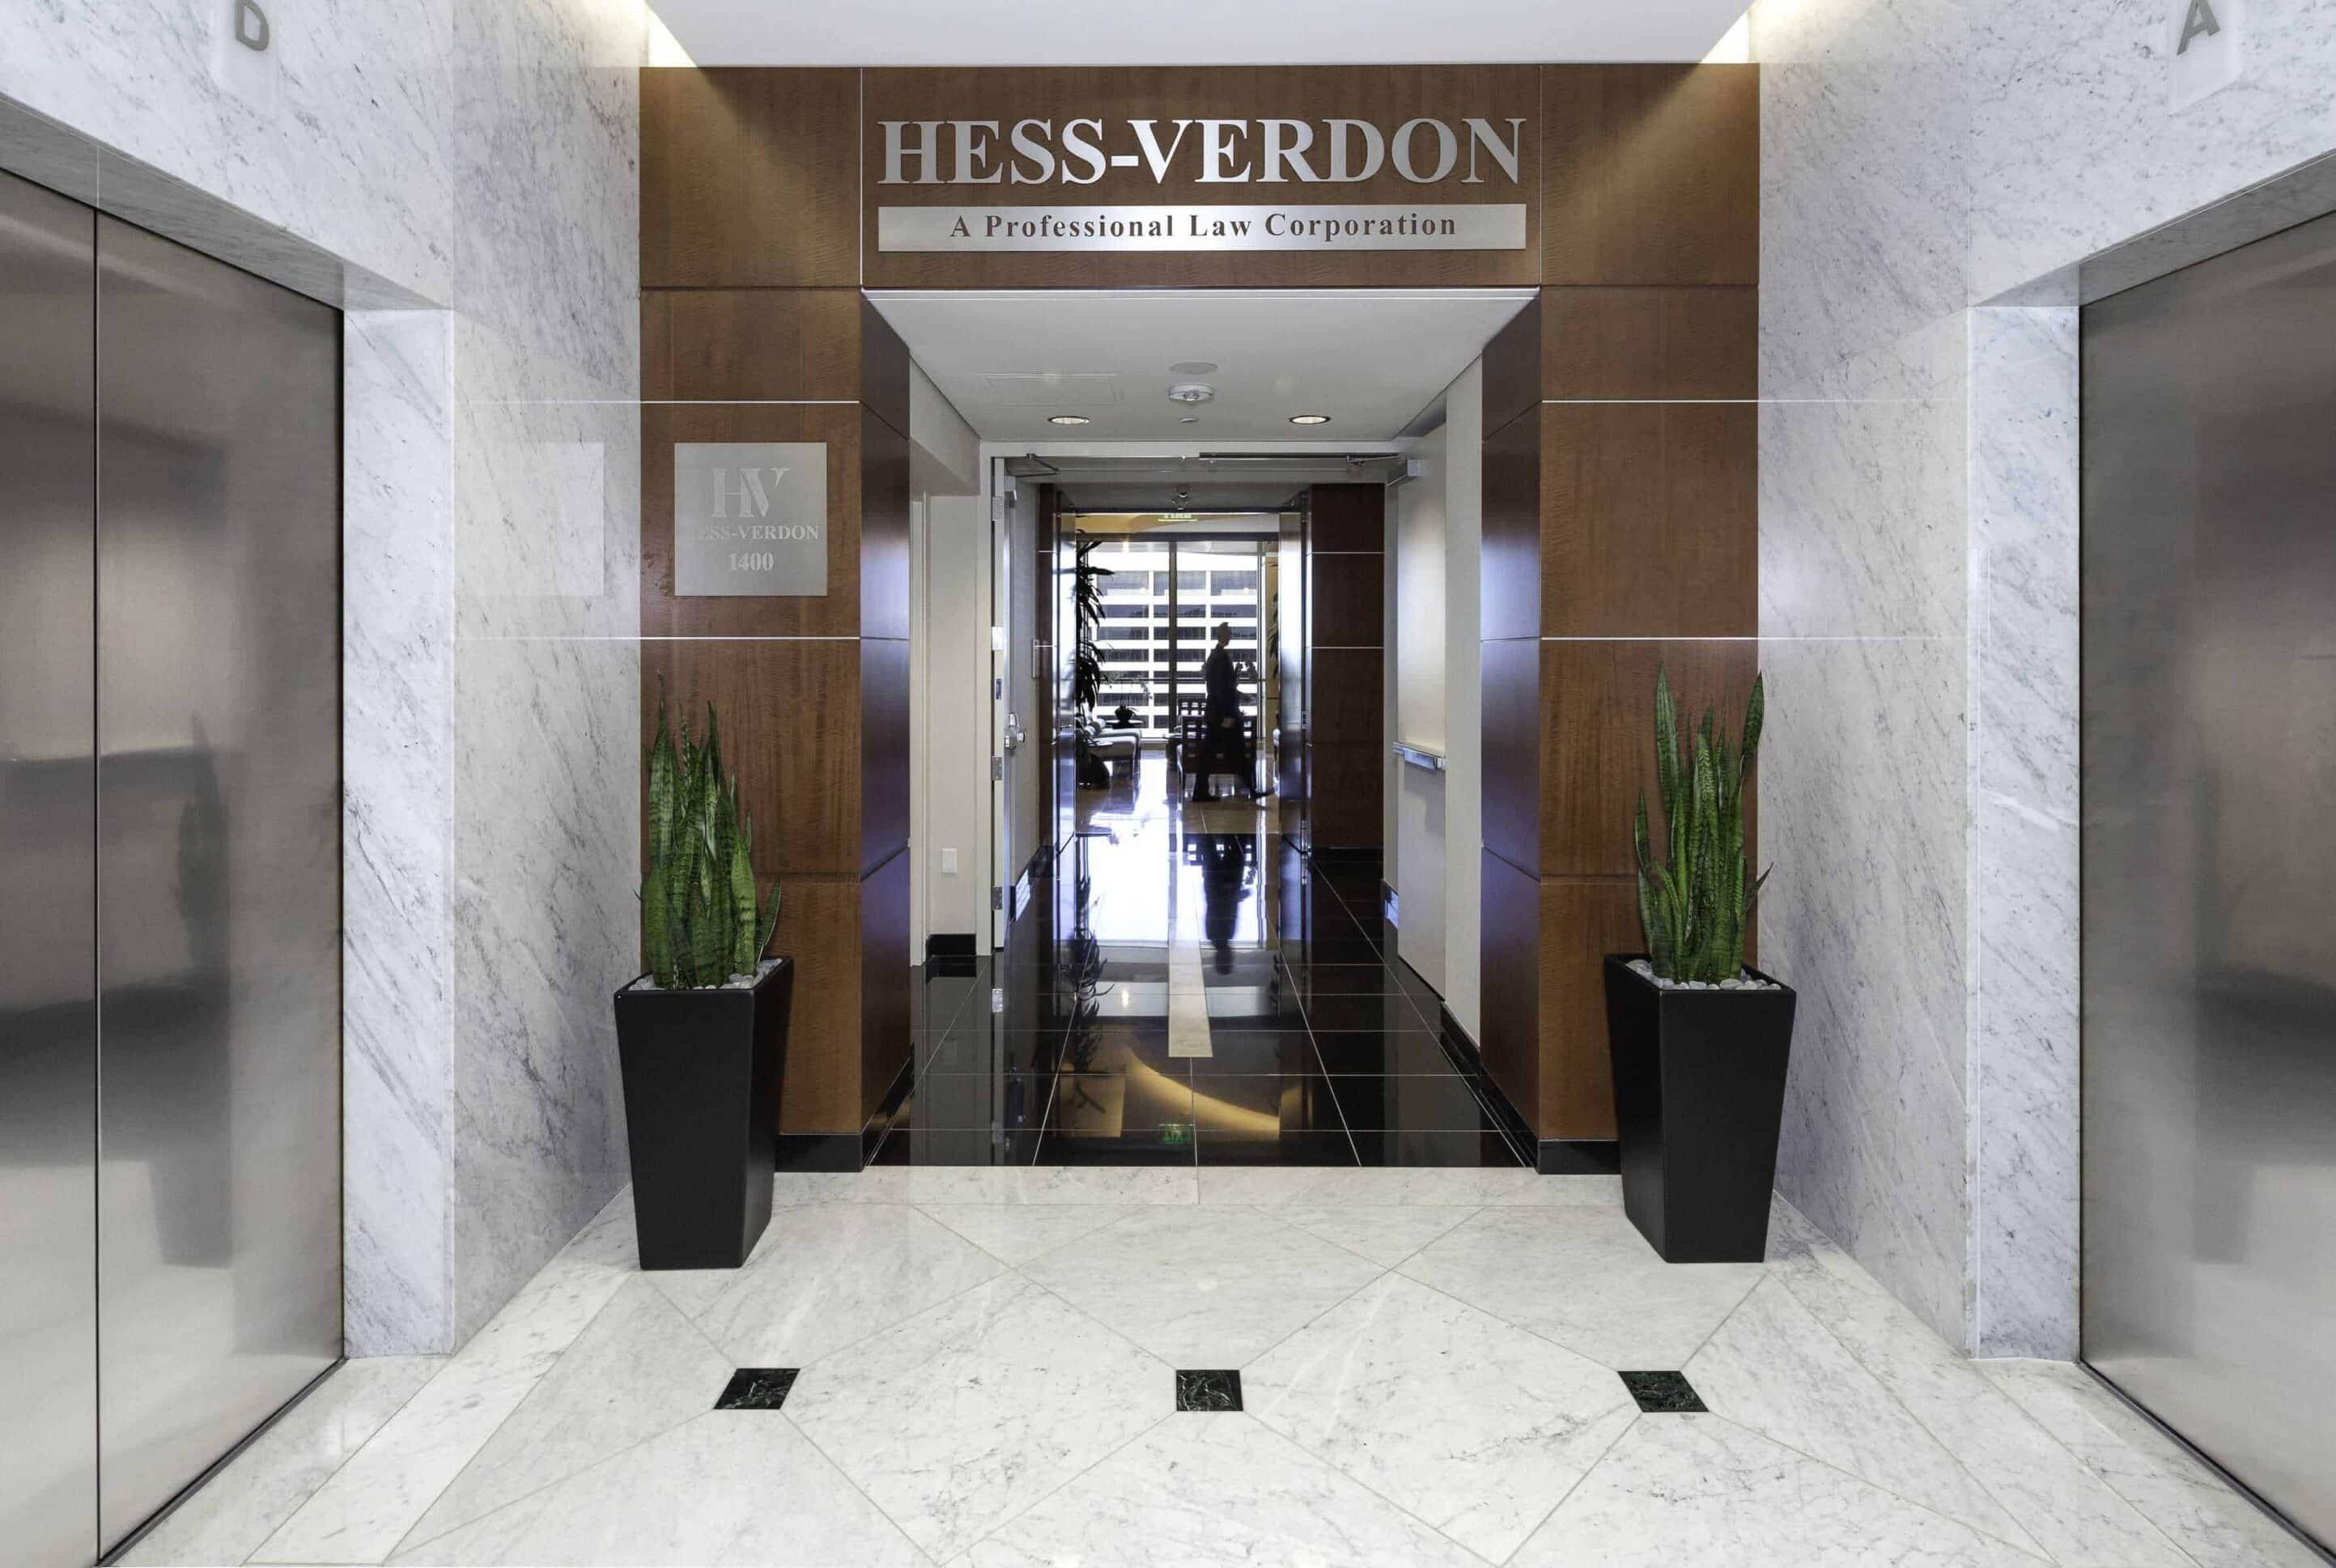 Hess-Verdon & Associates